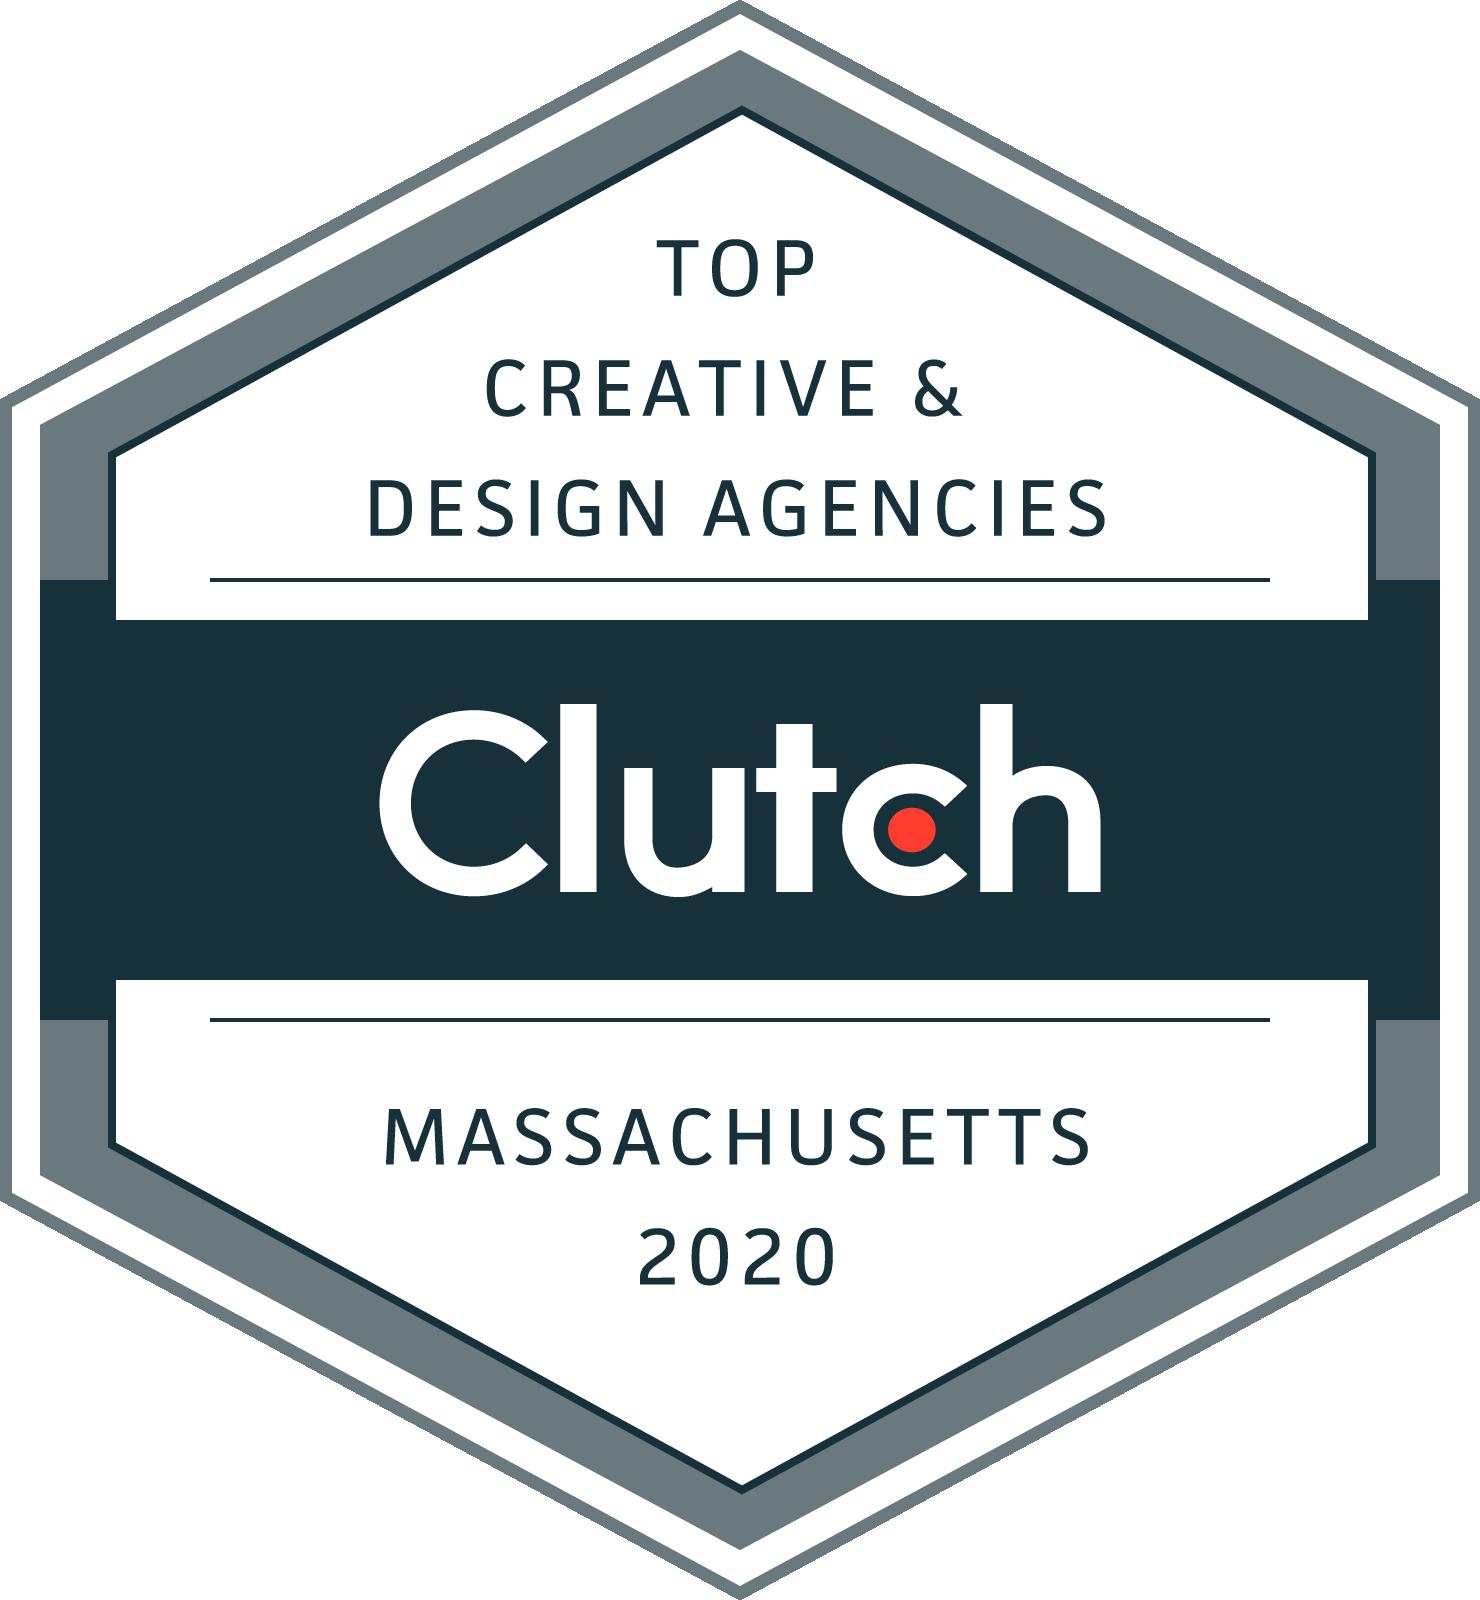 Creative_Design_Agencies_Massachusetts_2020